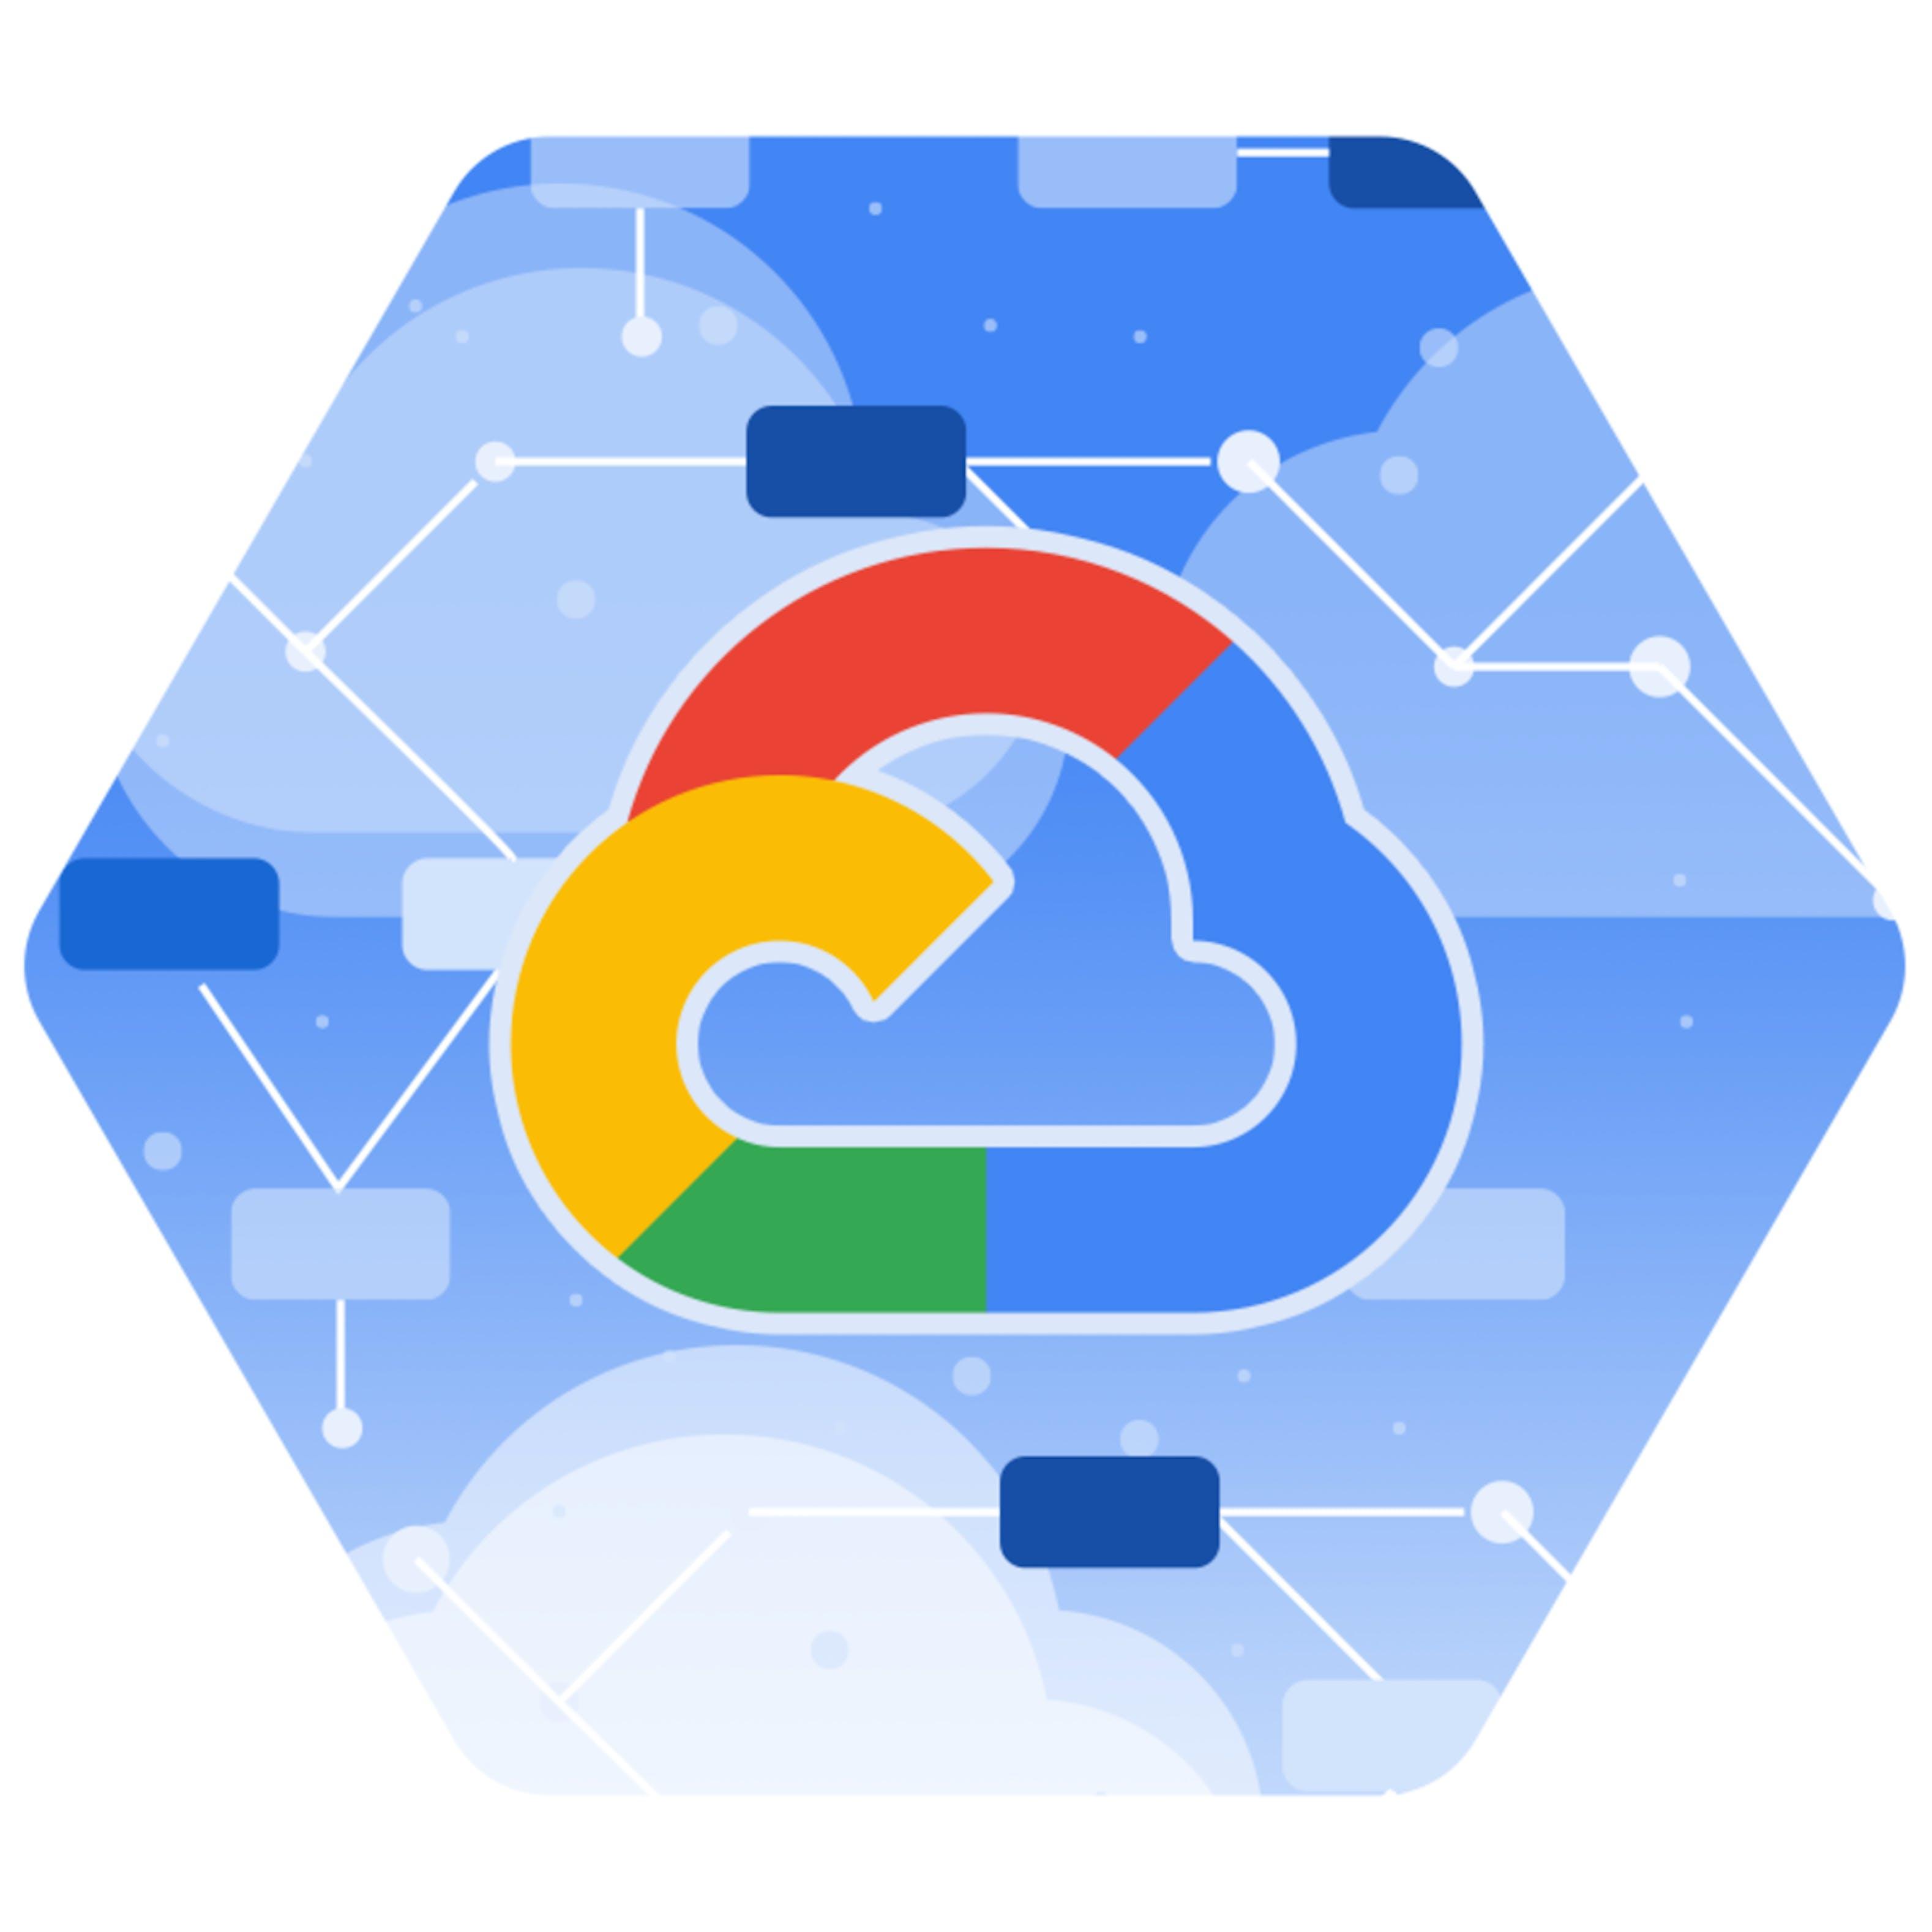 Preparing for the Google Cloud Professional Cloud Architect